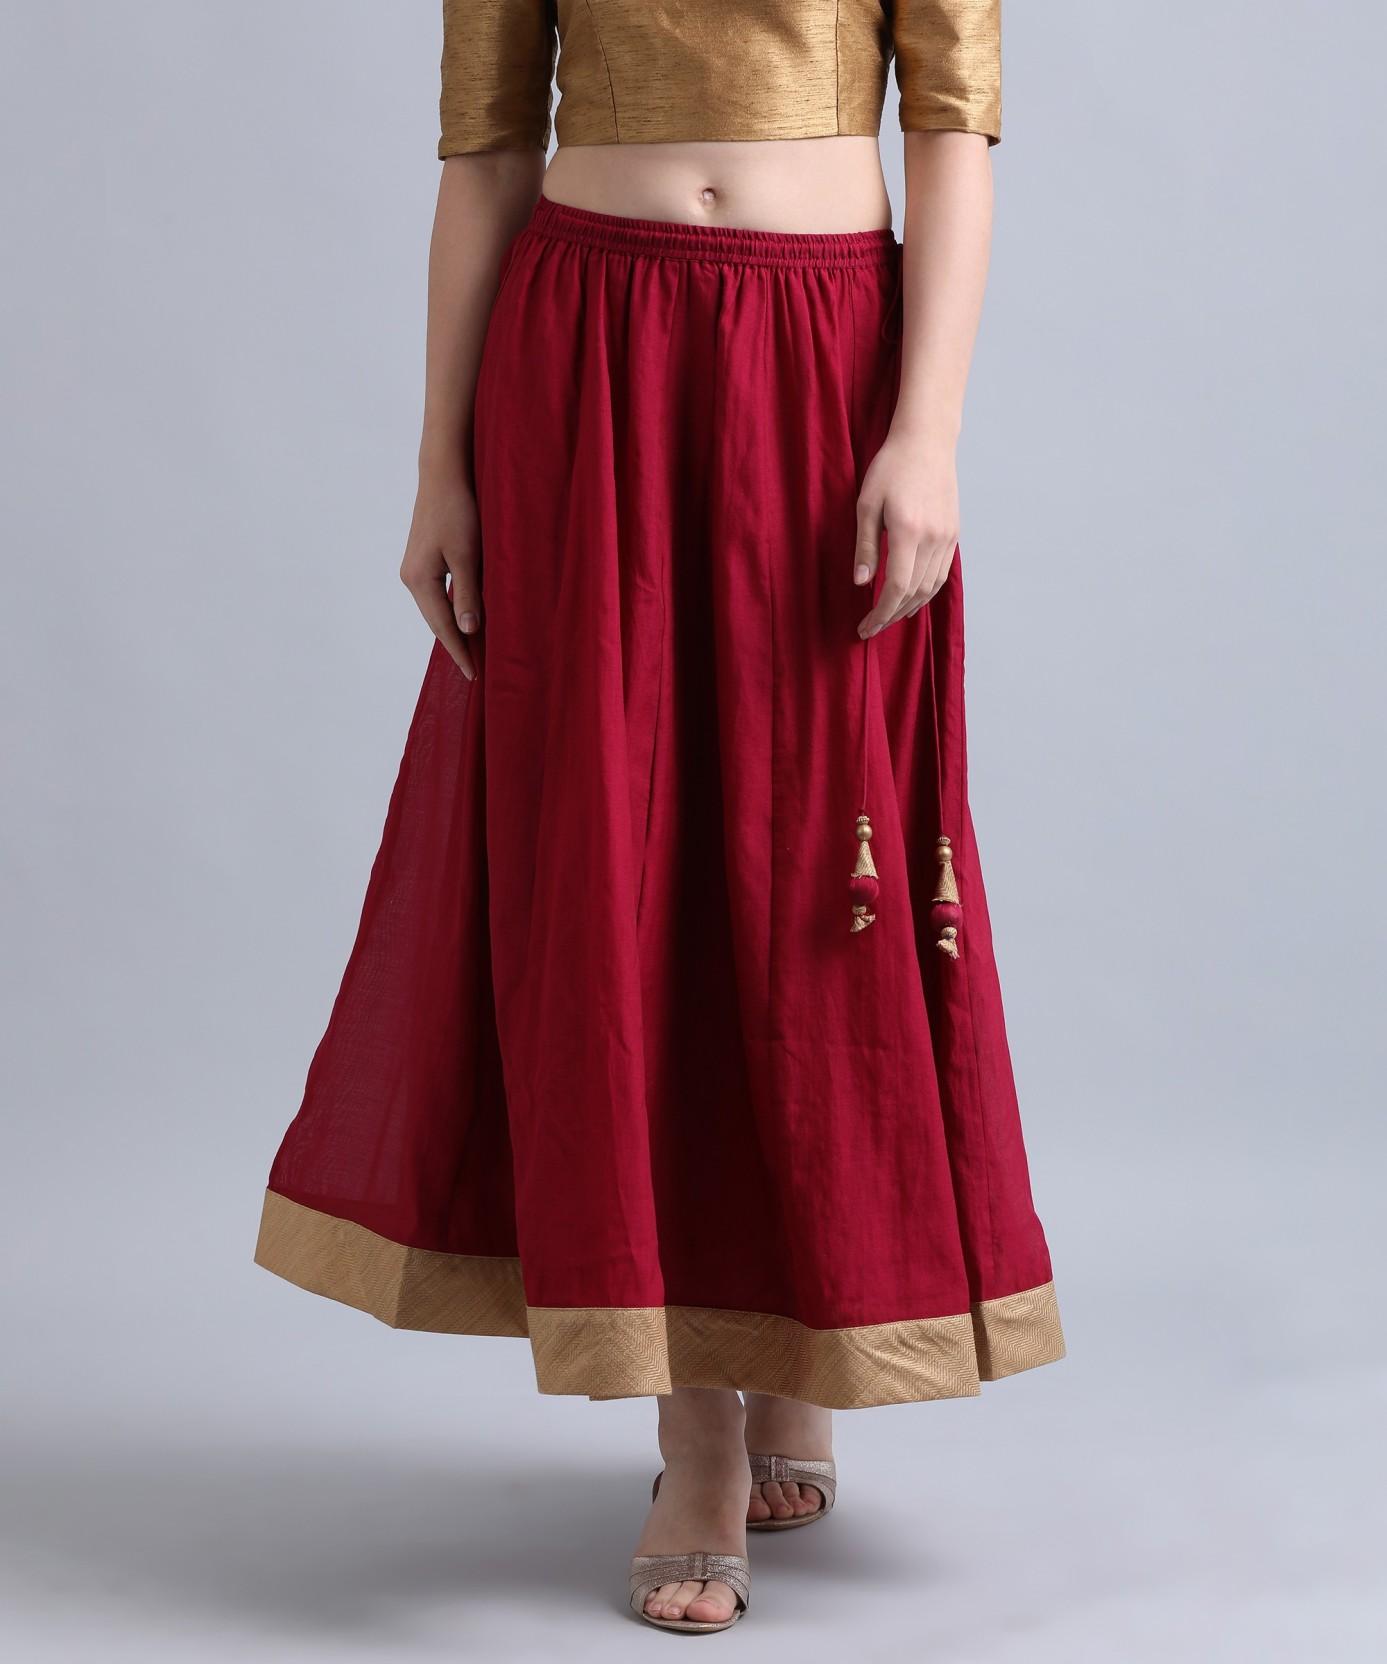 2a9515b6e2b4 Biba Solid Women's Flared Maroon Skirt - Buy BURGUNDY Biba Solid ...